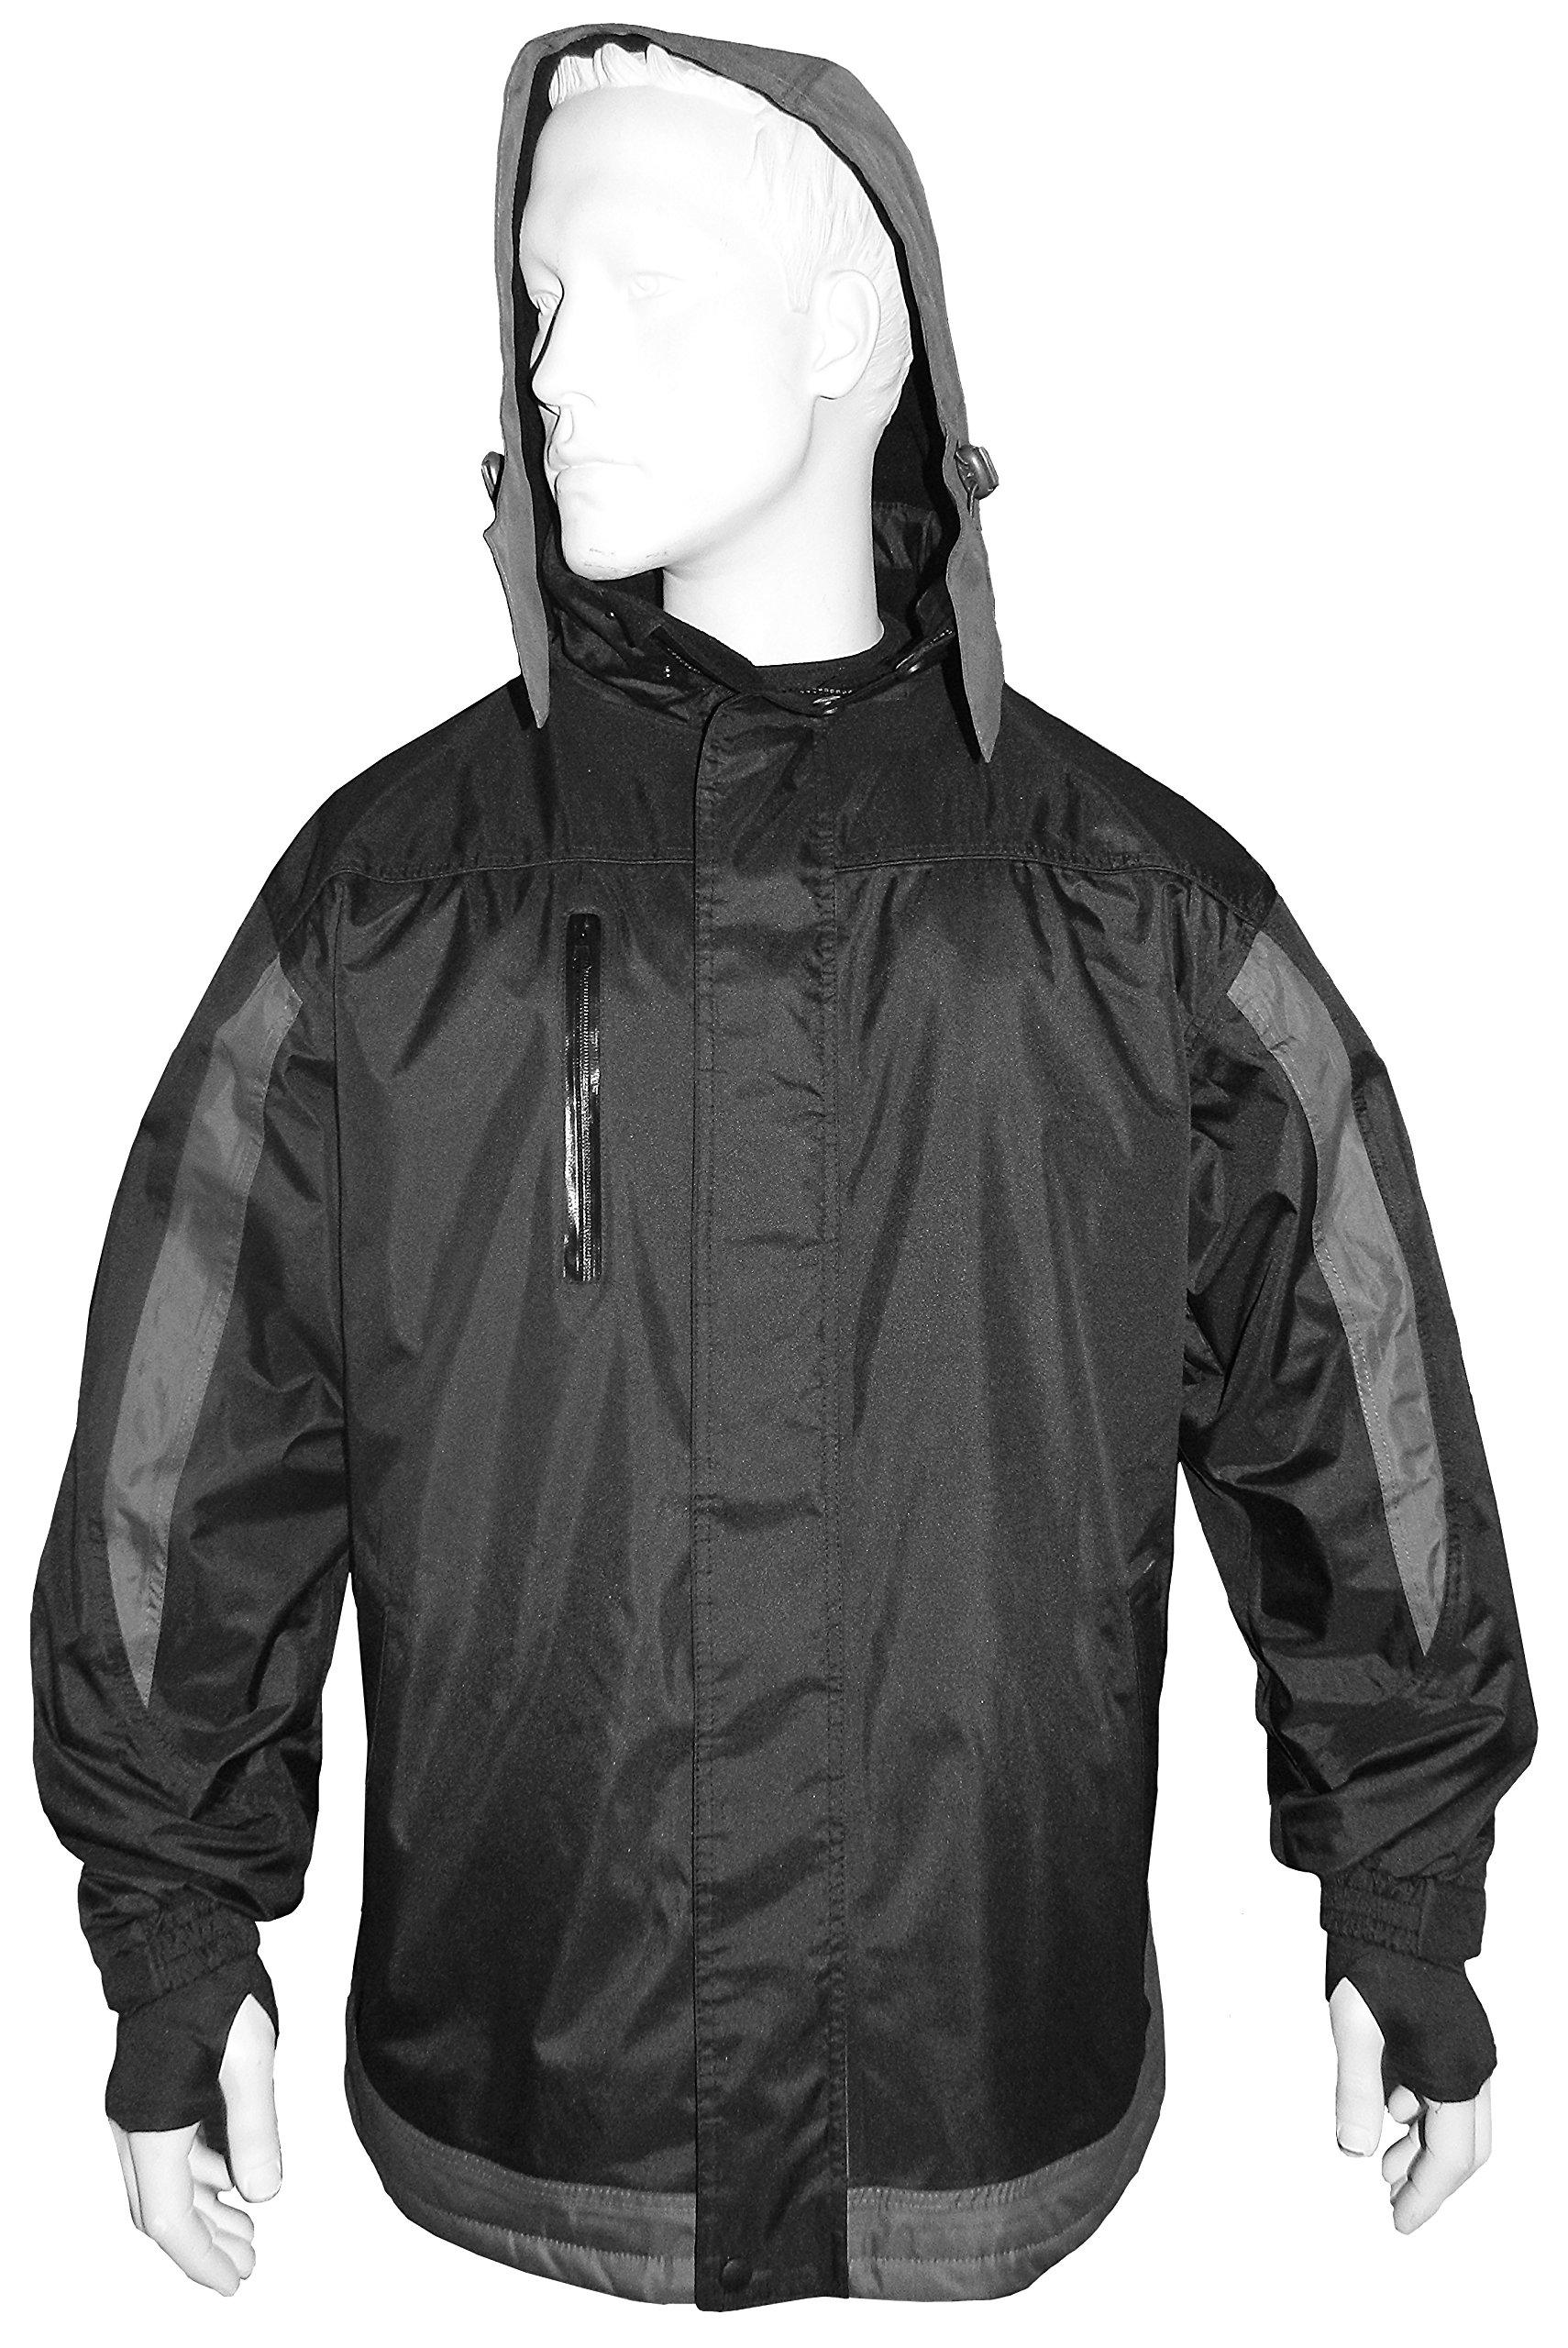 R.U. Outside Vortex Storm Layer - Wind/Water Proof Jacket, Medium/Chest 48-50-Inch, Black/Gray